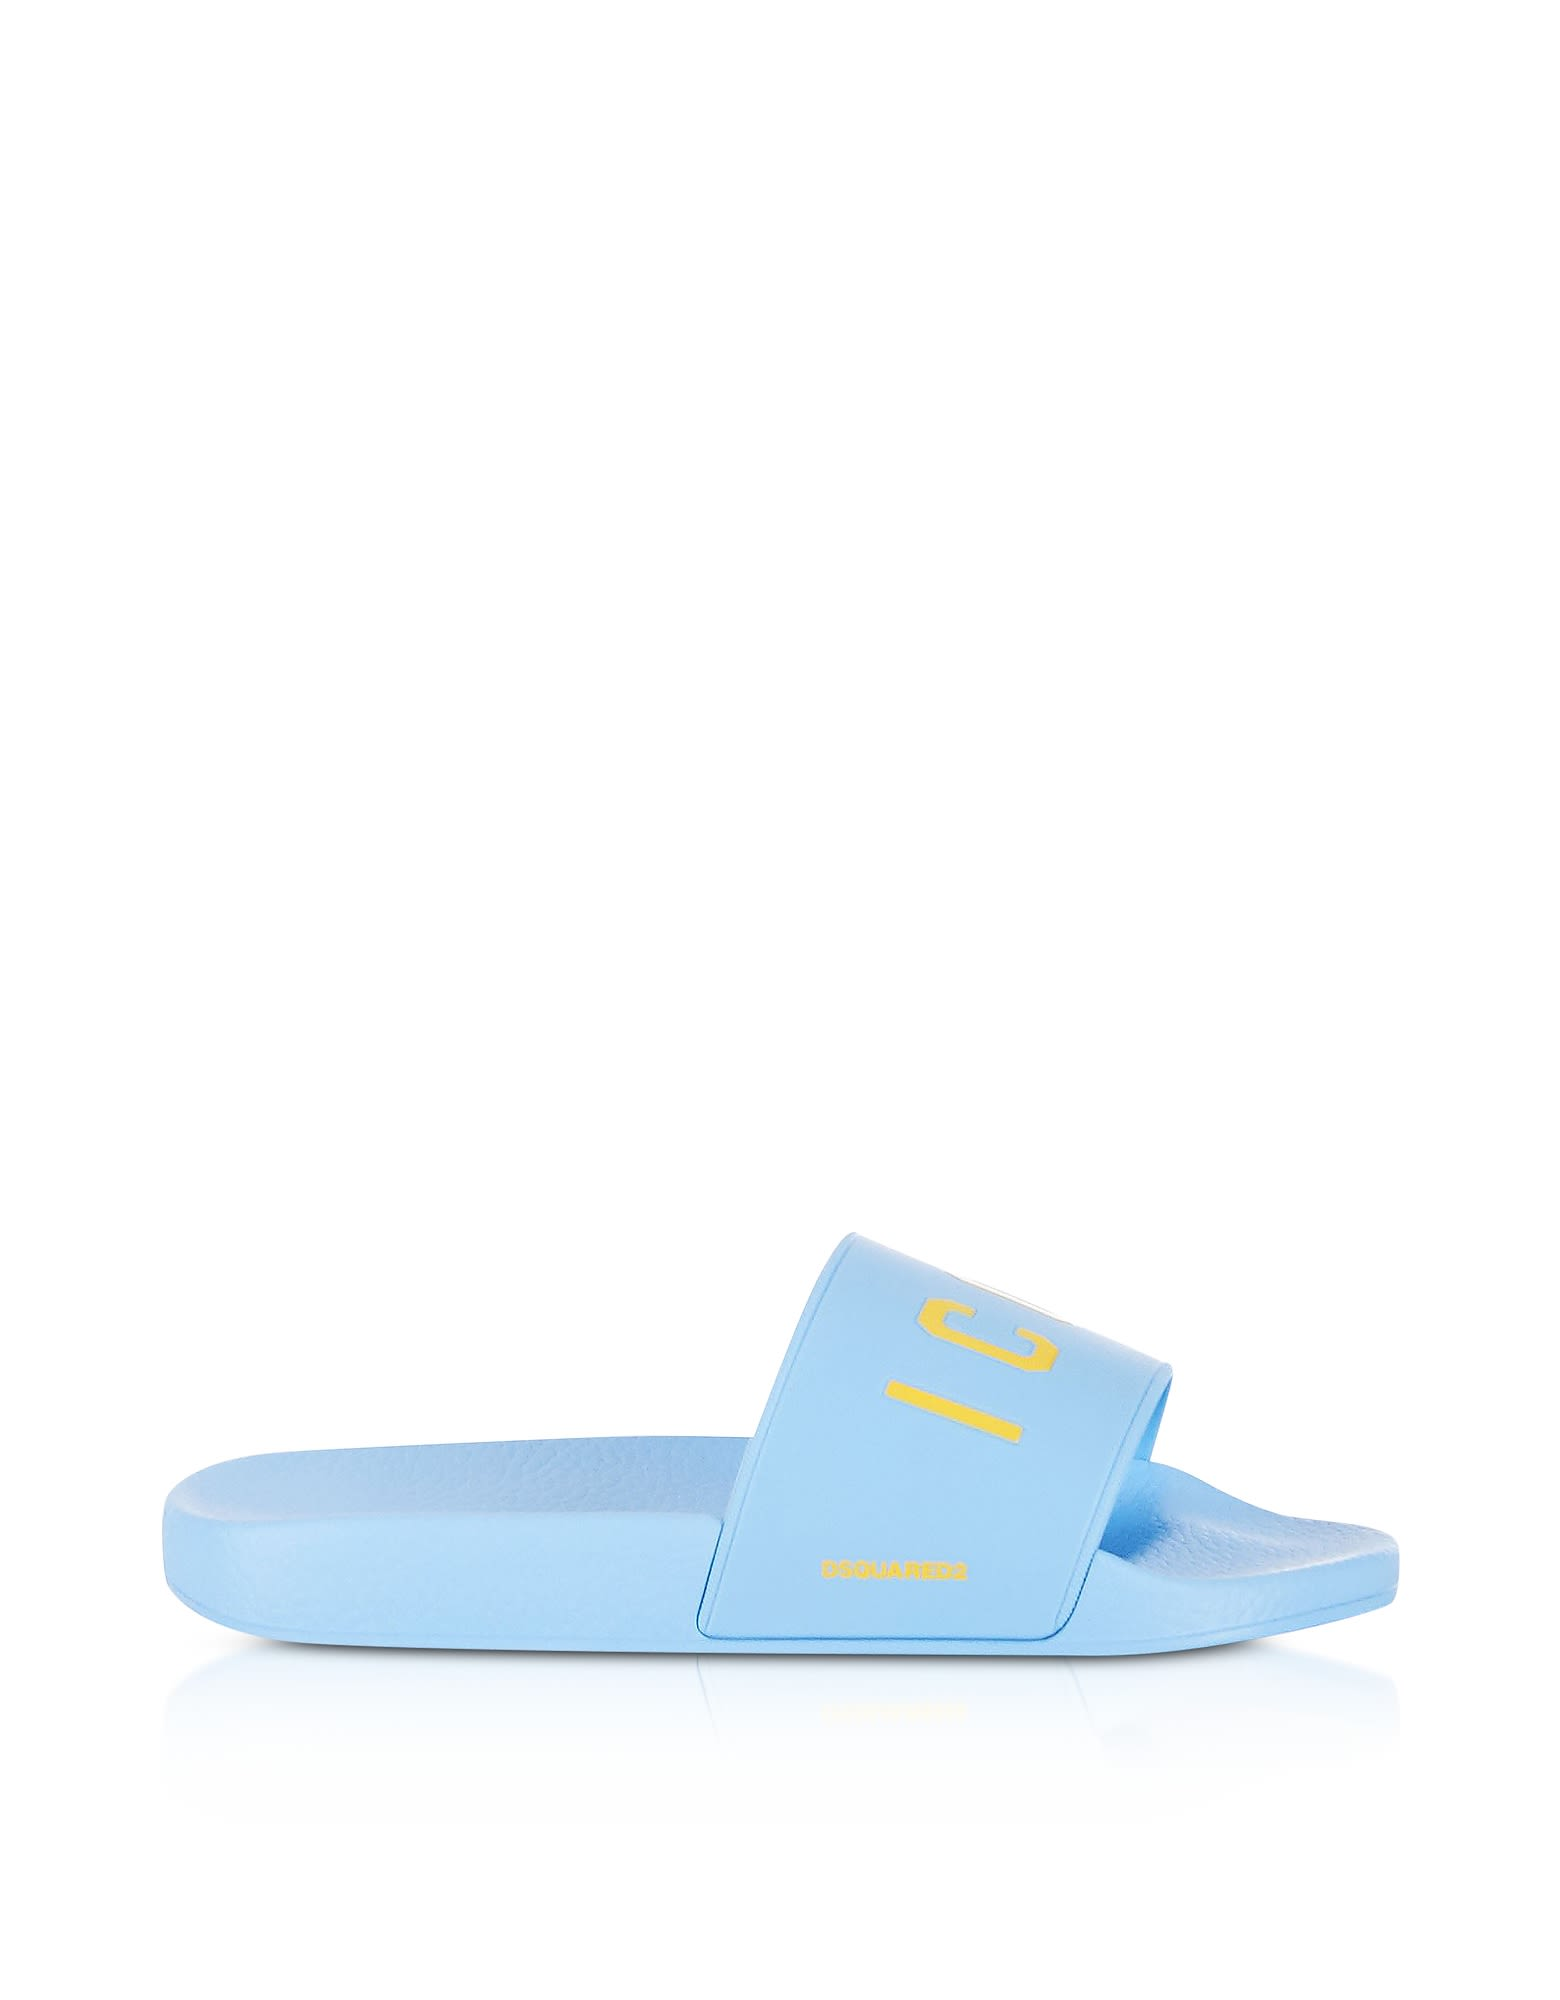 Dsquared2 Icon Sky Blue Rubber Slide Sandals